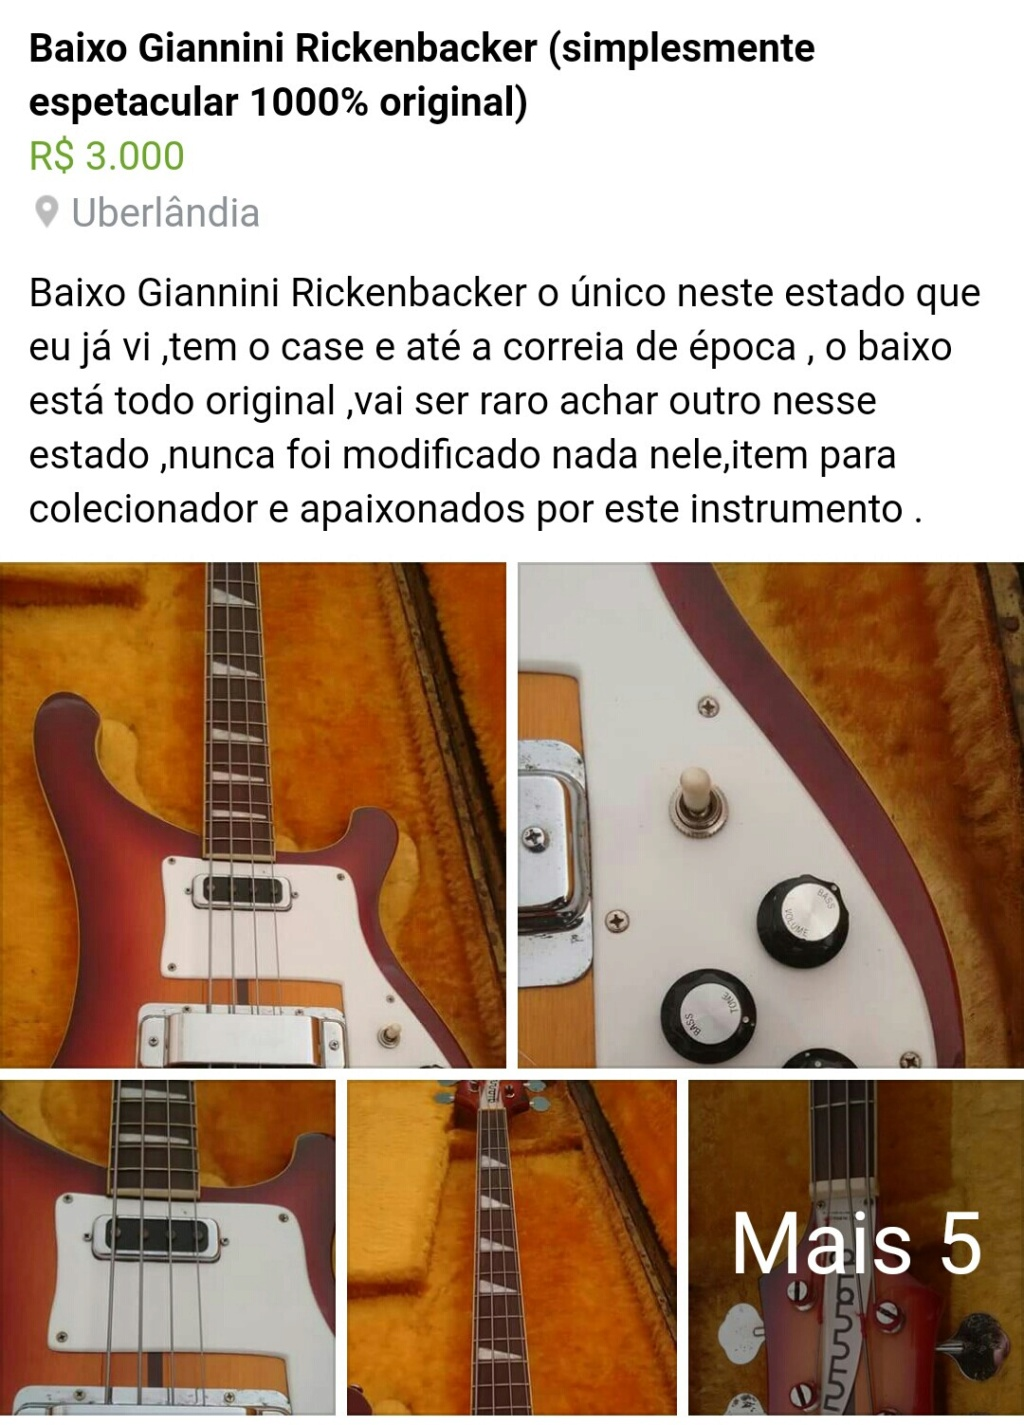 Giannini Rickenbacker - Página 6 Screen10